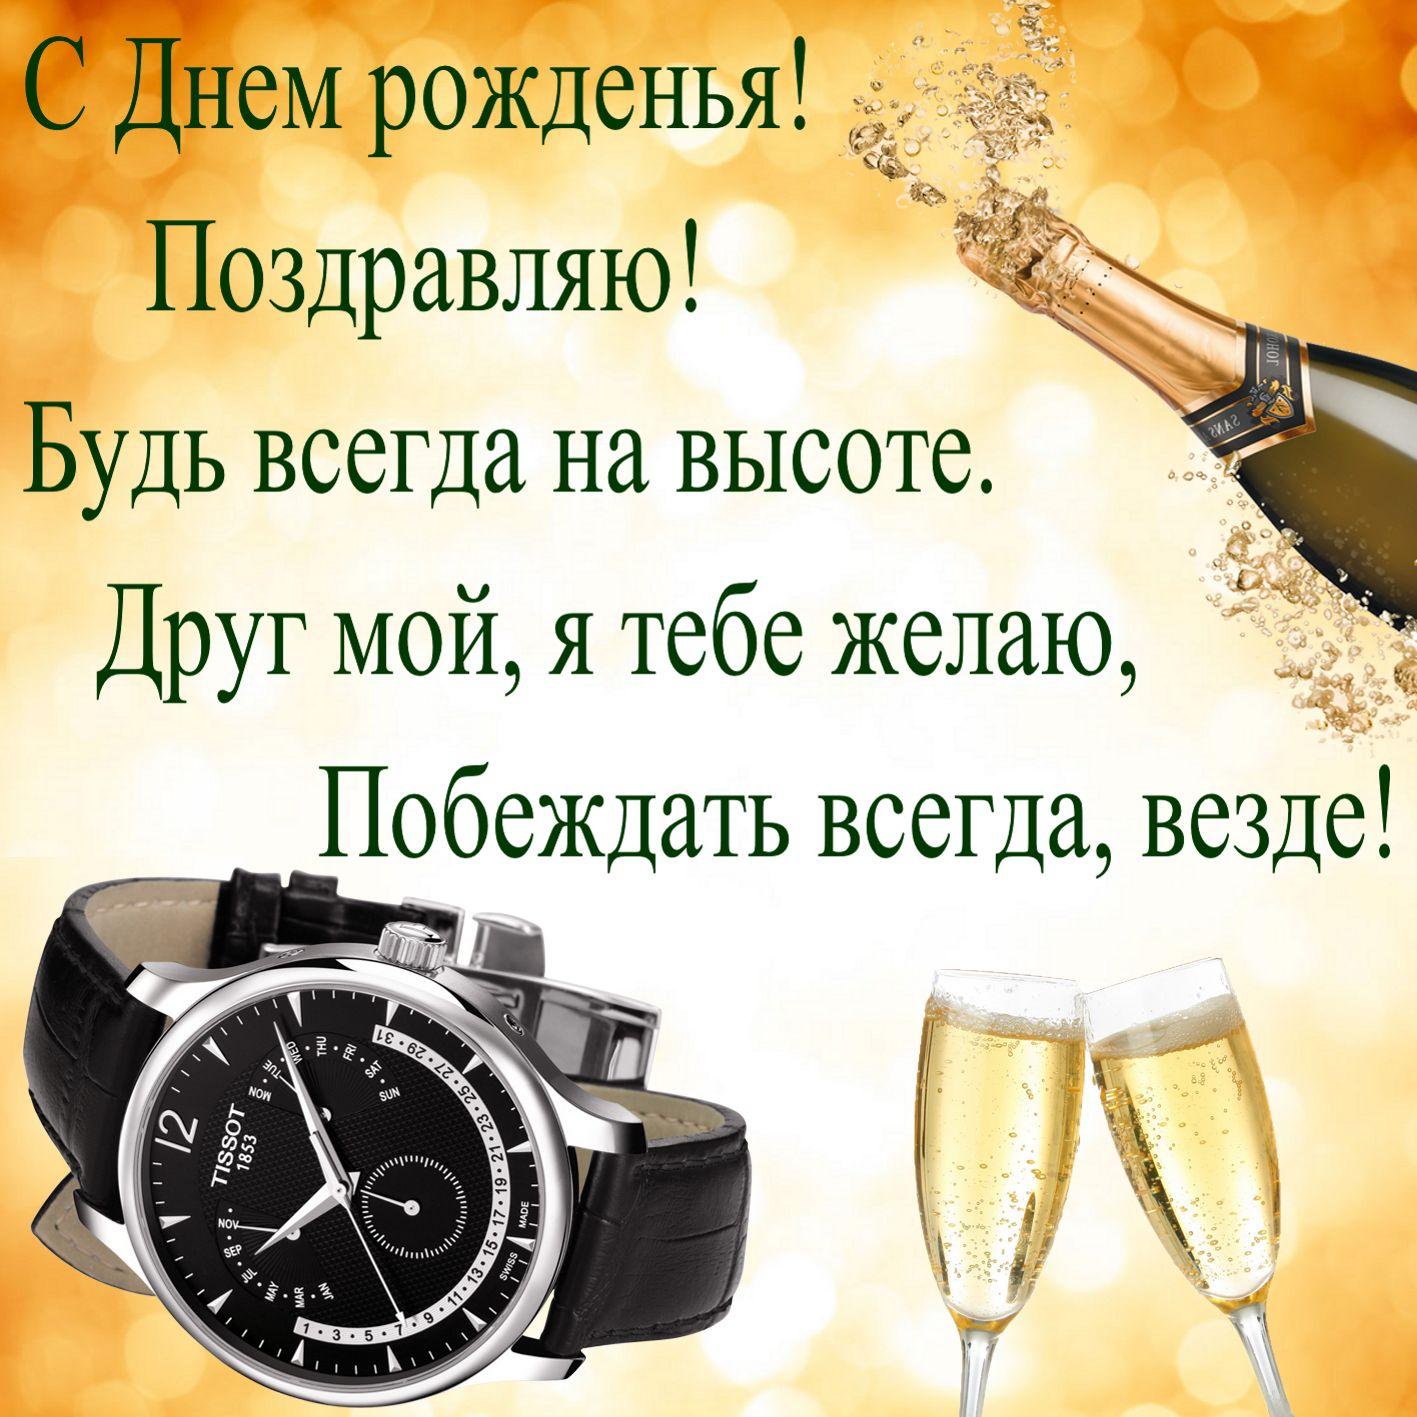 Картинка другу с шампанским и часами